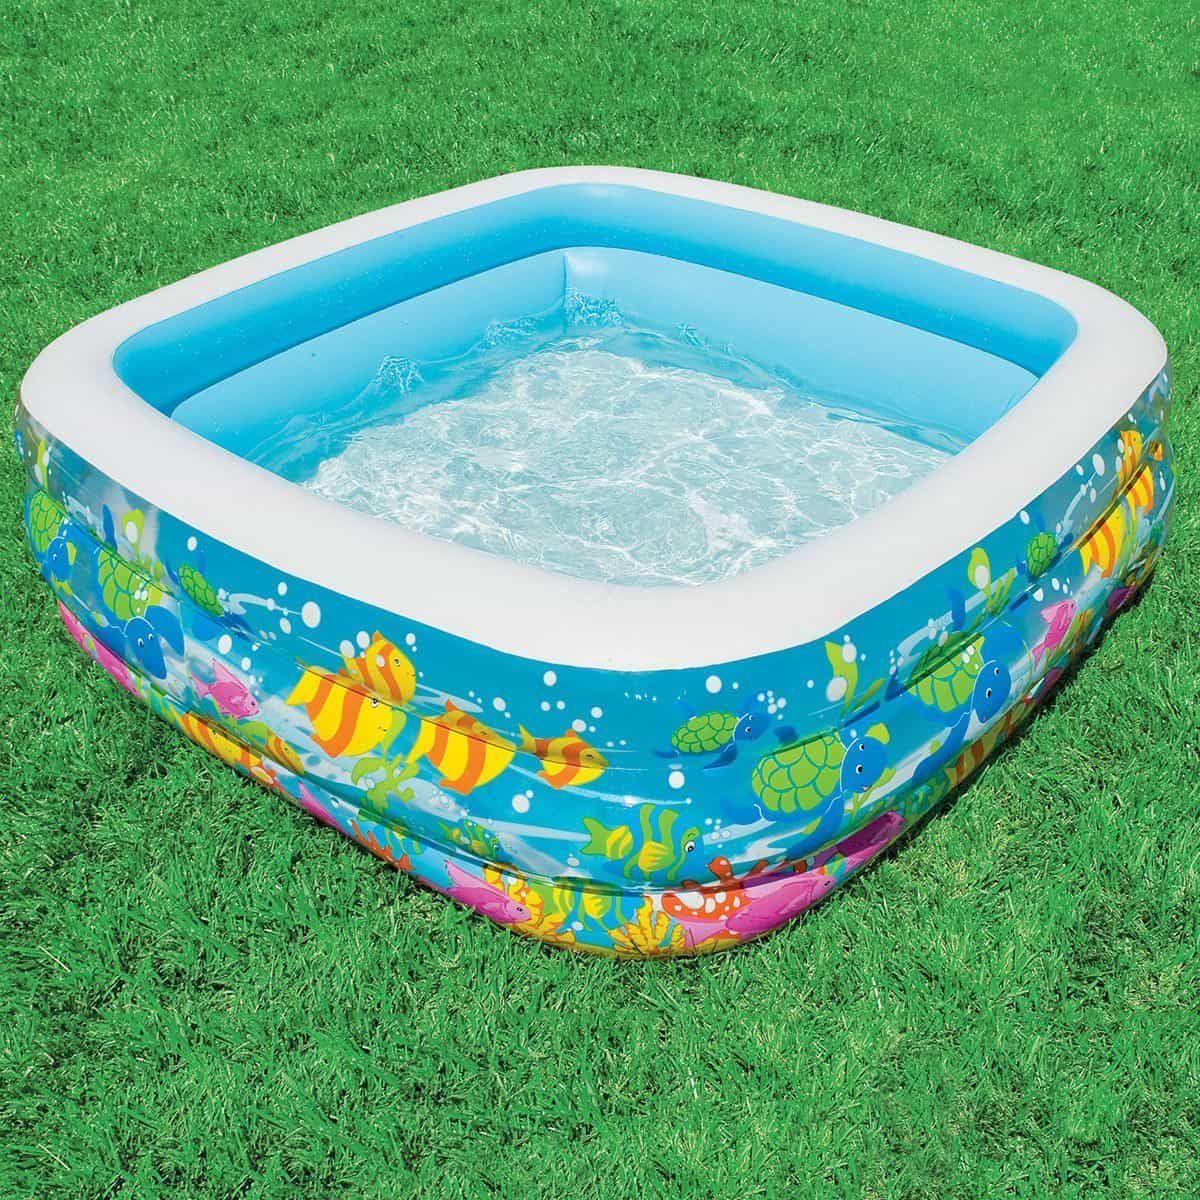 Easy Too Install Inflatable Swimming Pools Kids Aquarium